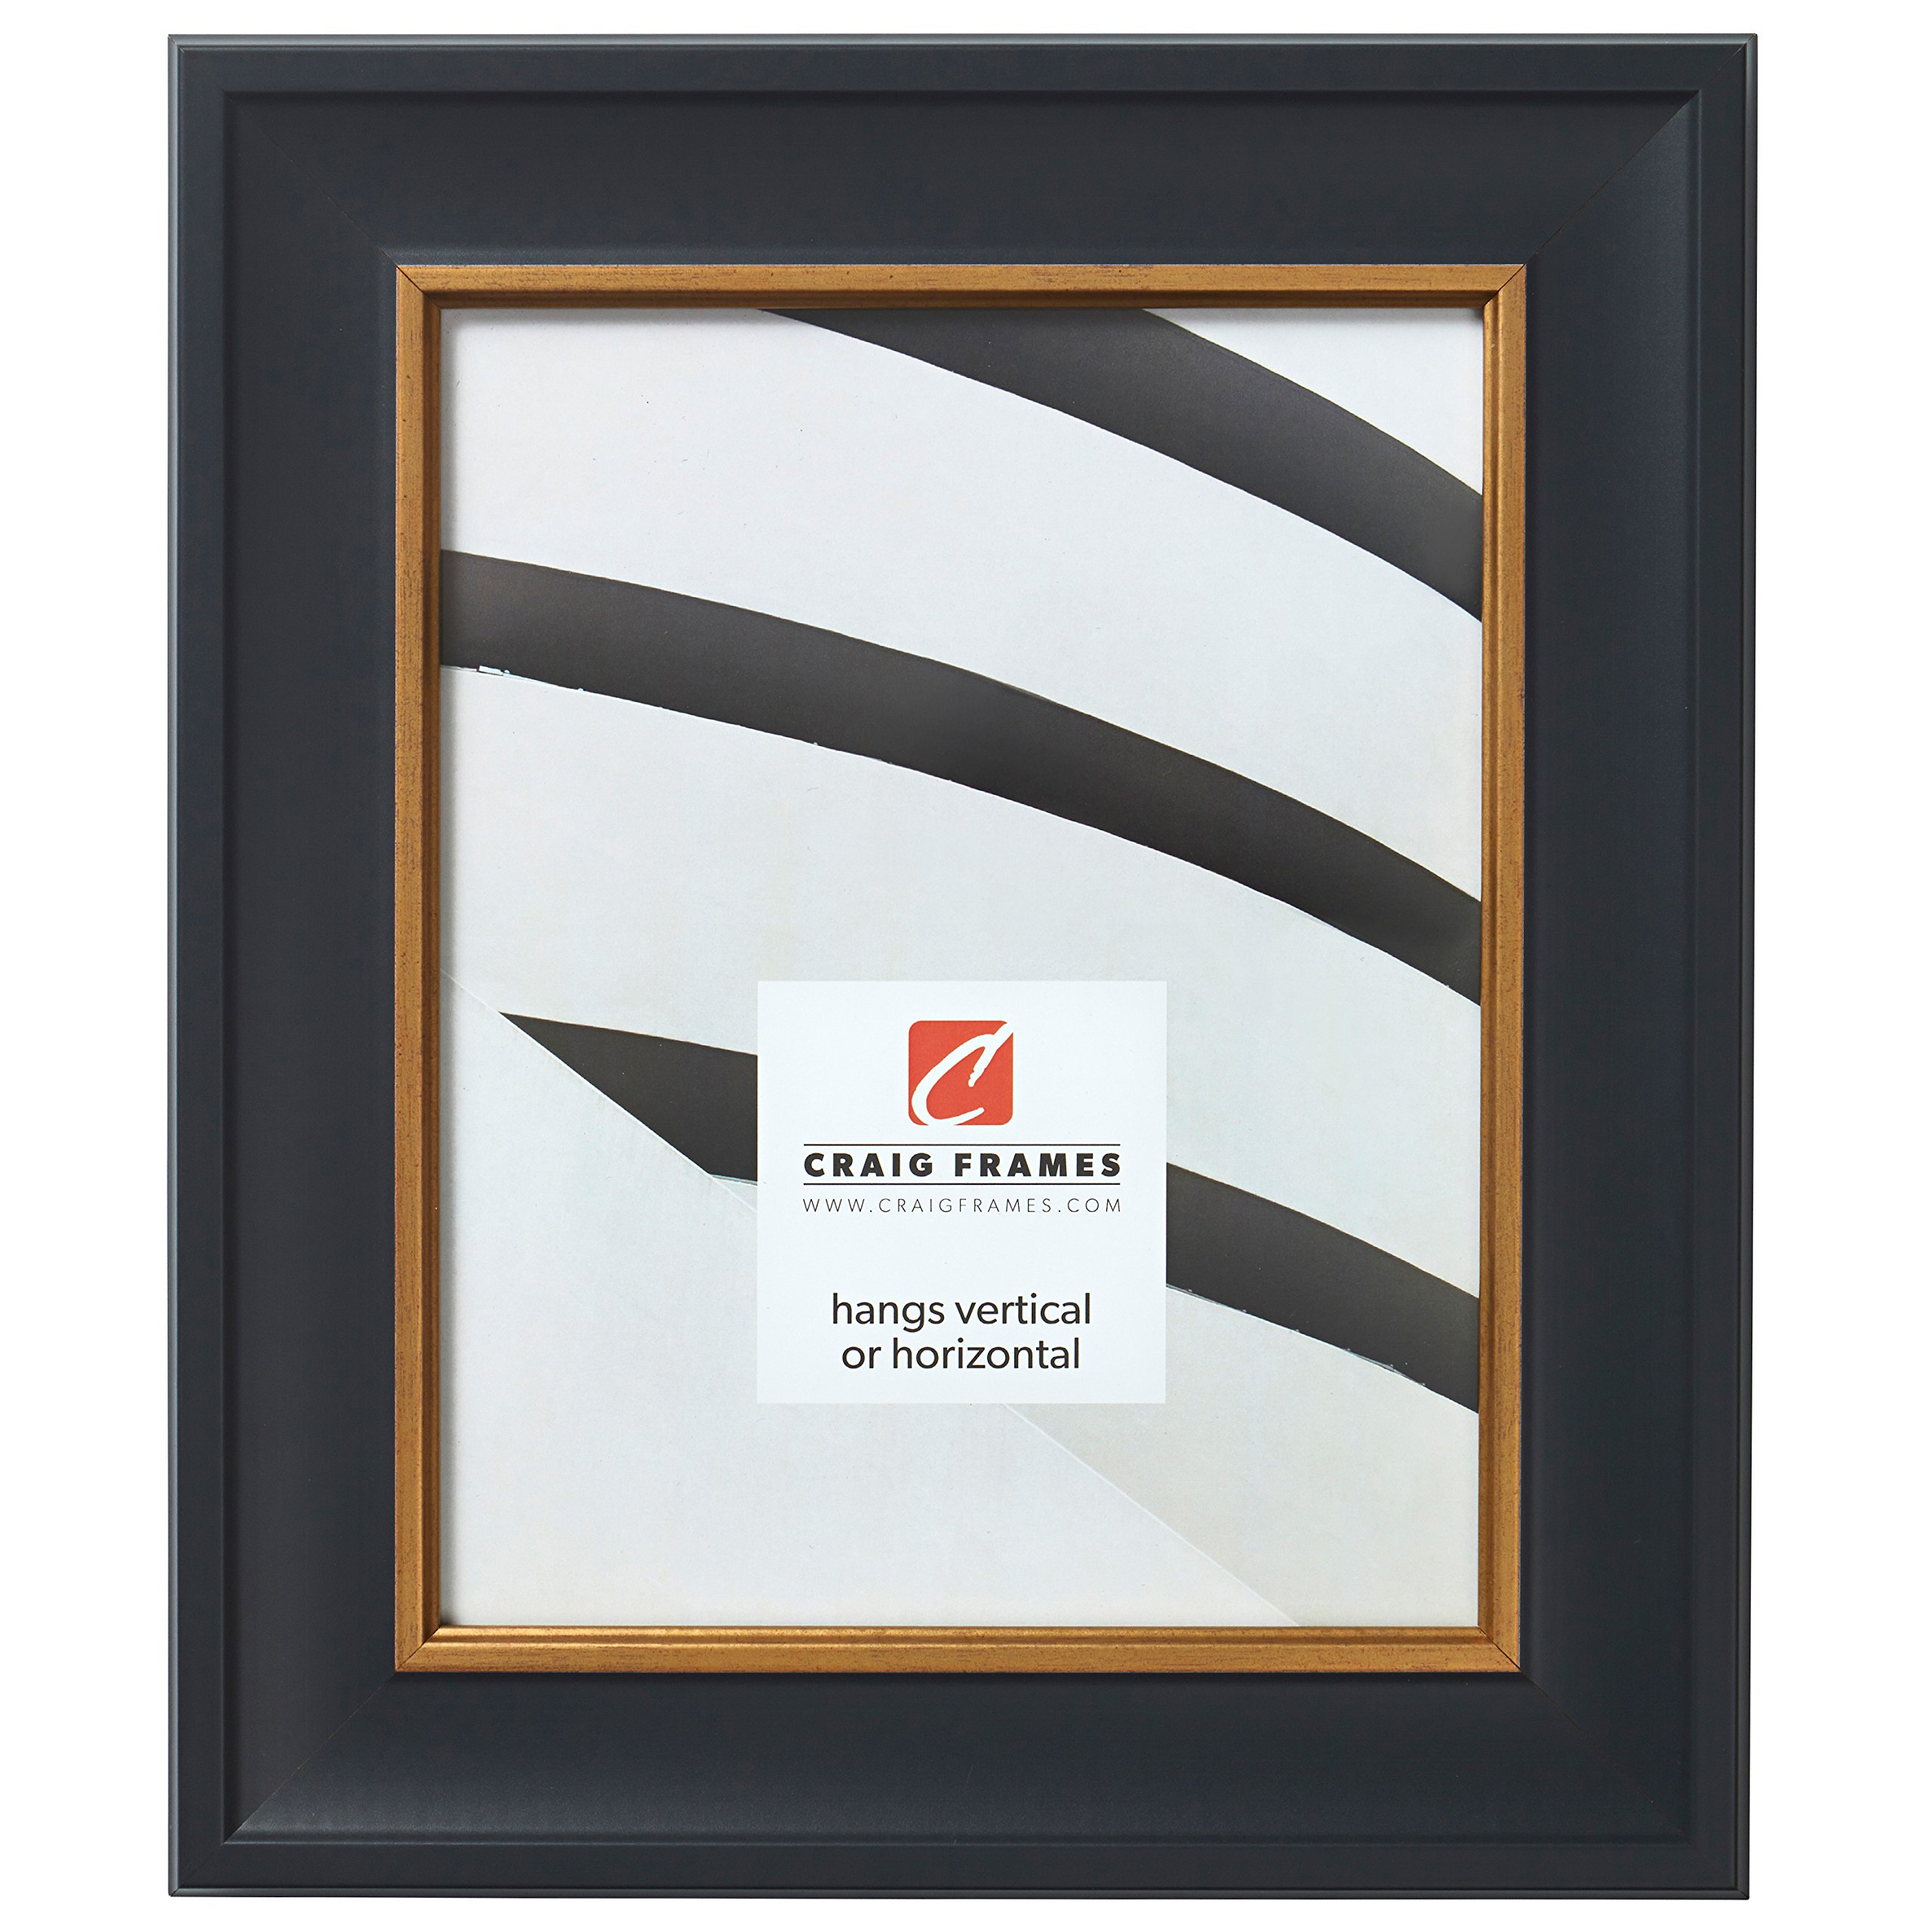 Craig Frames Martin Picture Frame, 20 x 27 Inch, Black Velvet with Gold